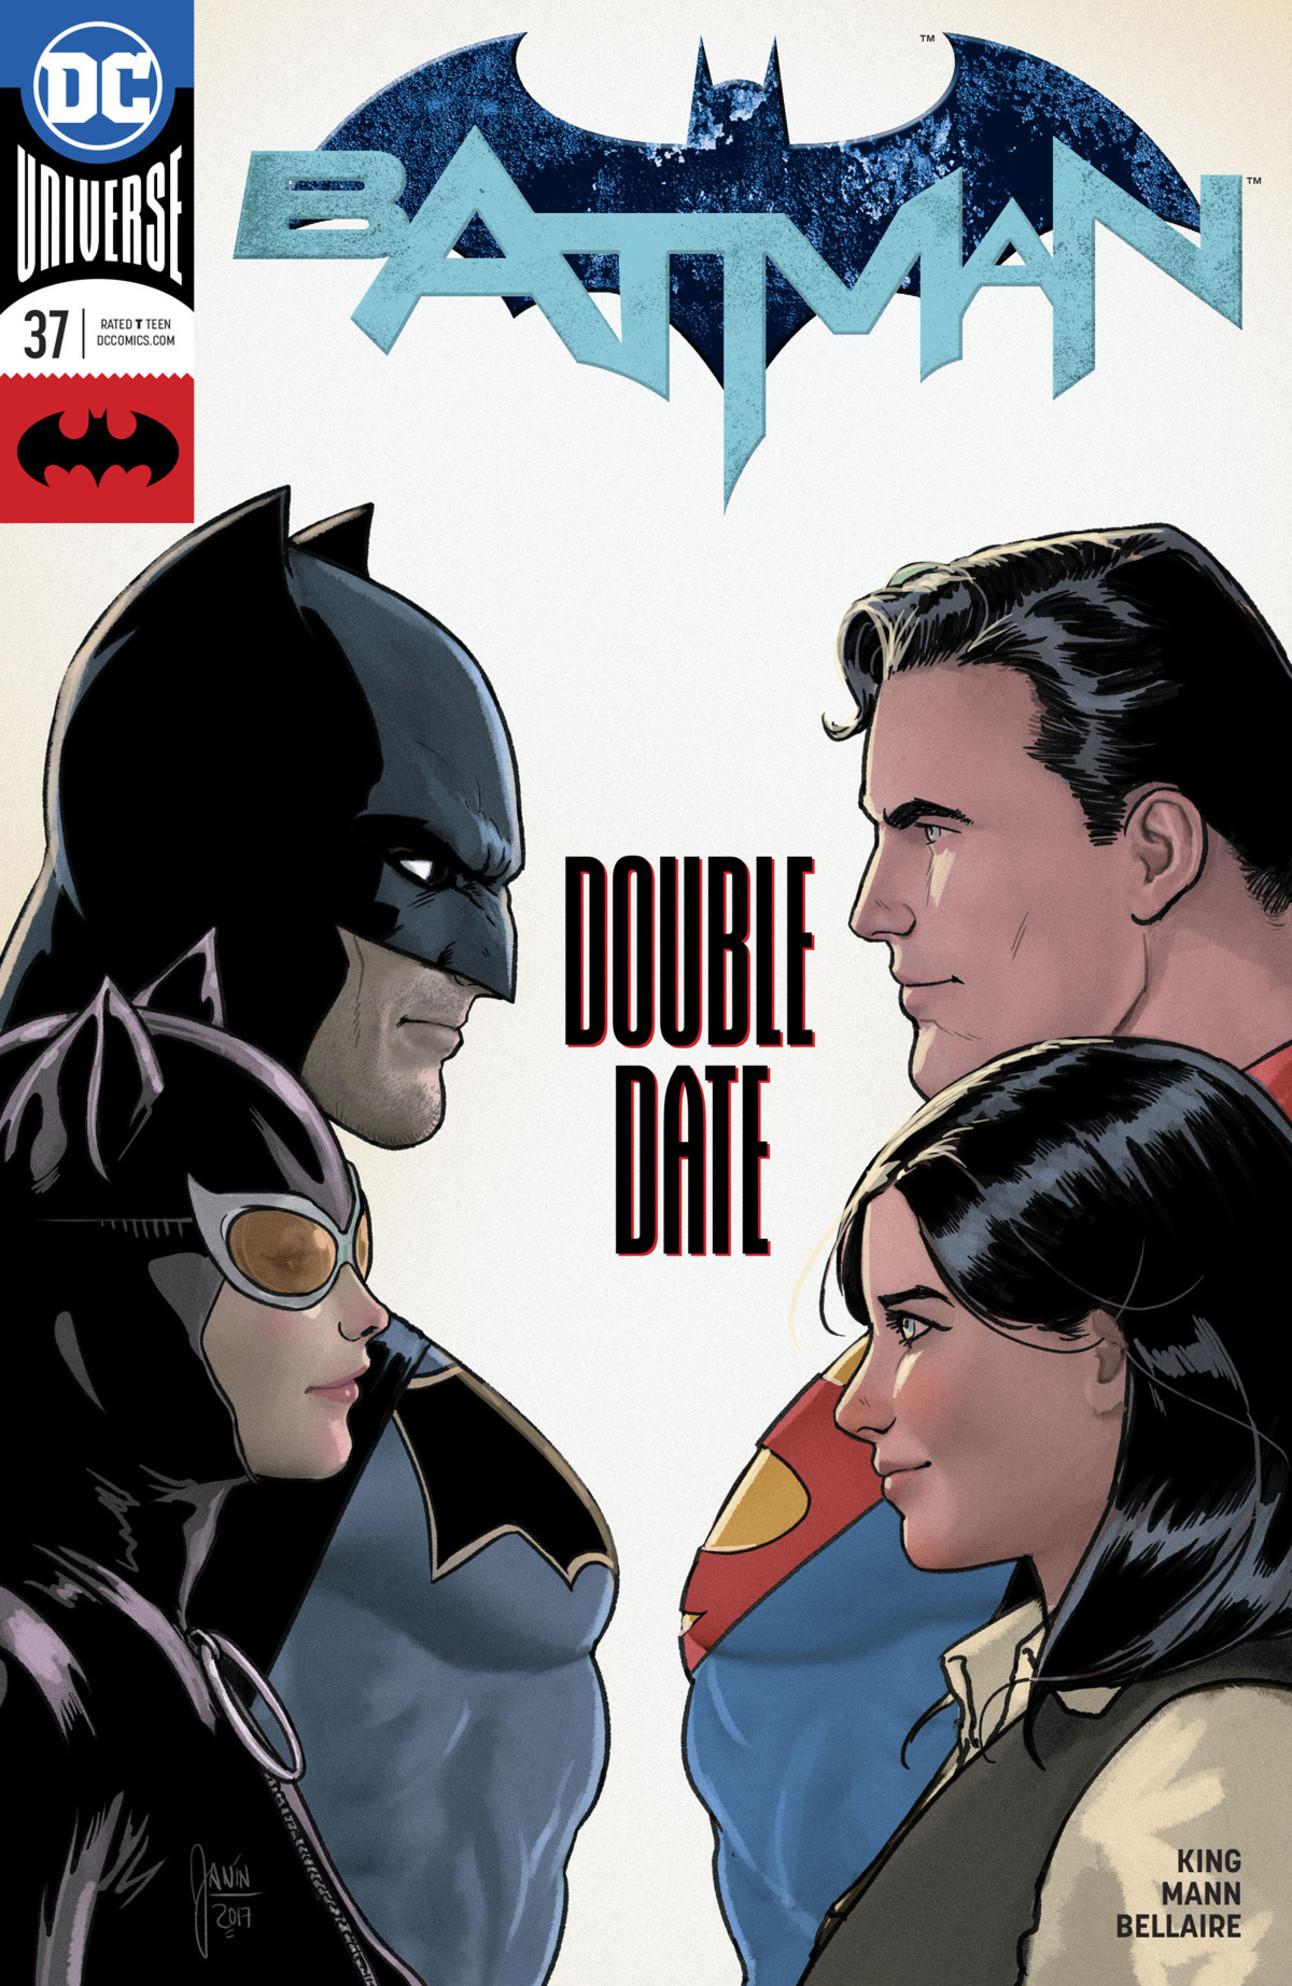 batman-37-superman-lois-lane-catwoman-dc-comics-rebirth-universe-spoilers-1.jpg